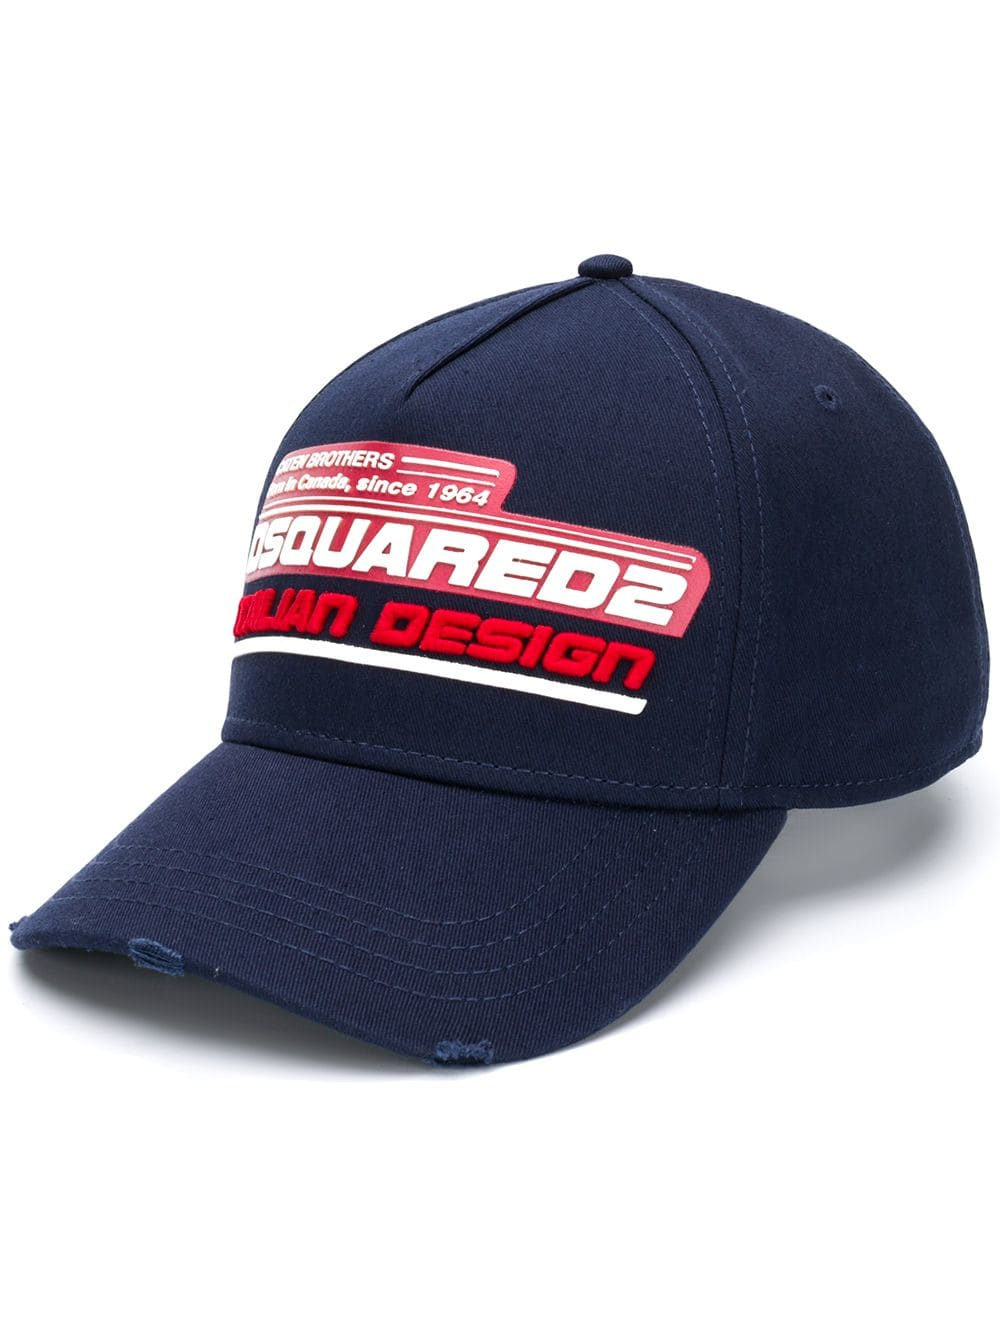 b5bd1ff7 Italian Design Baseball Cap - DSQUARED2 - Russocapri